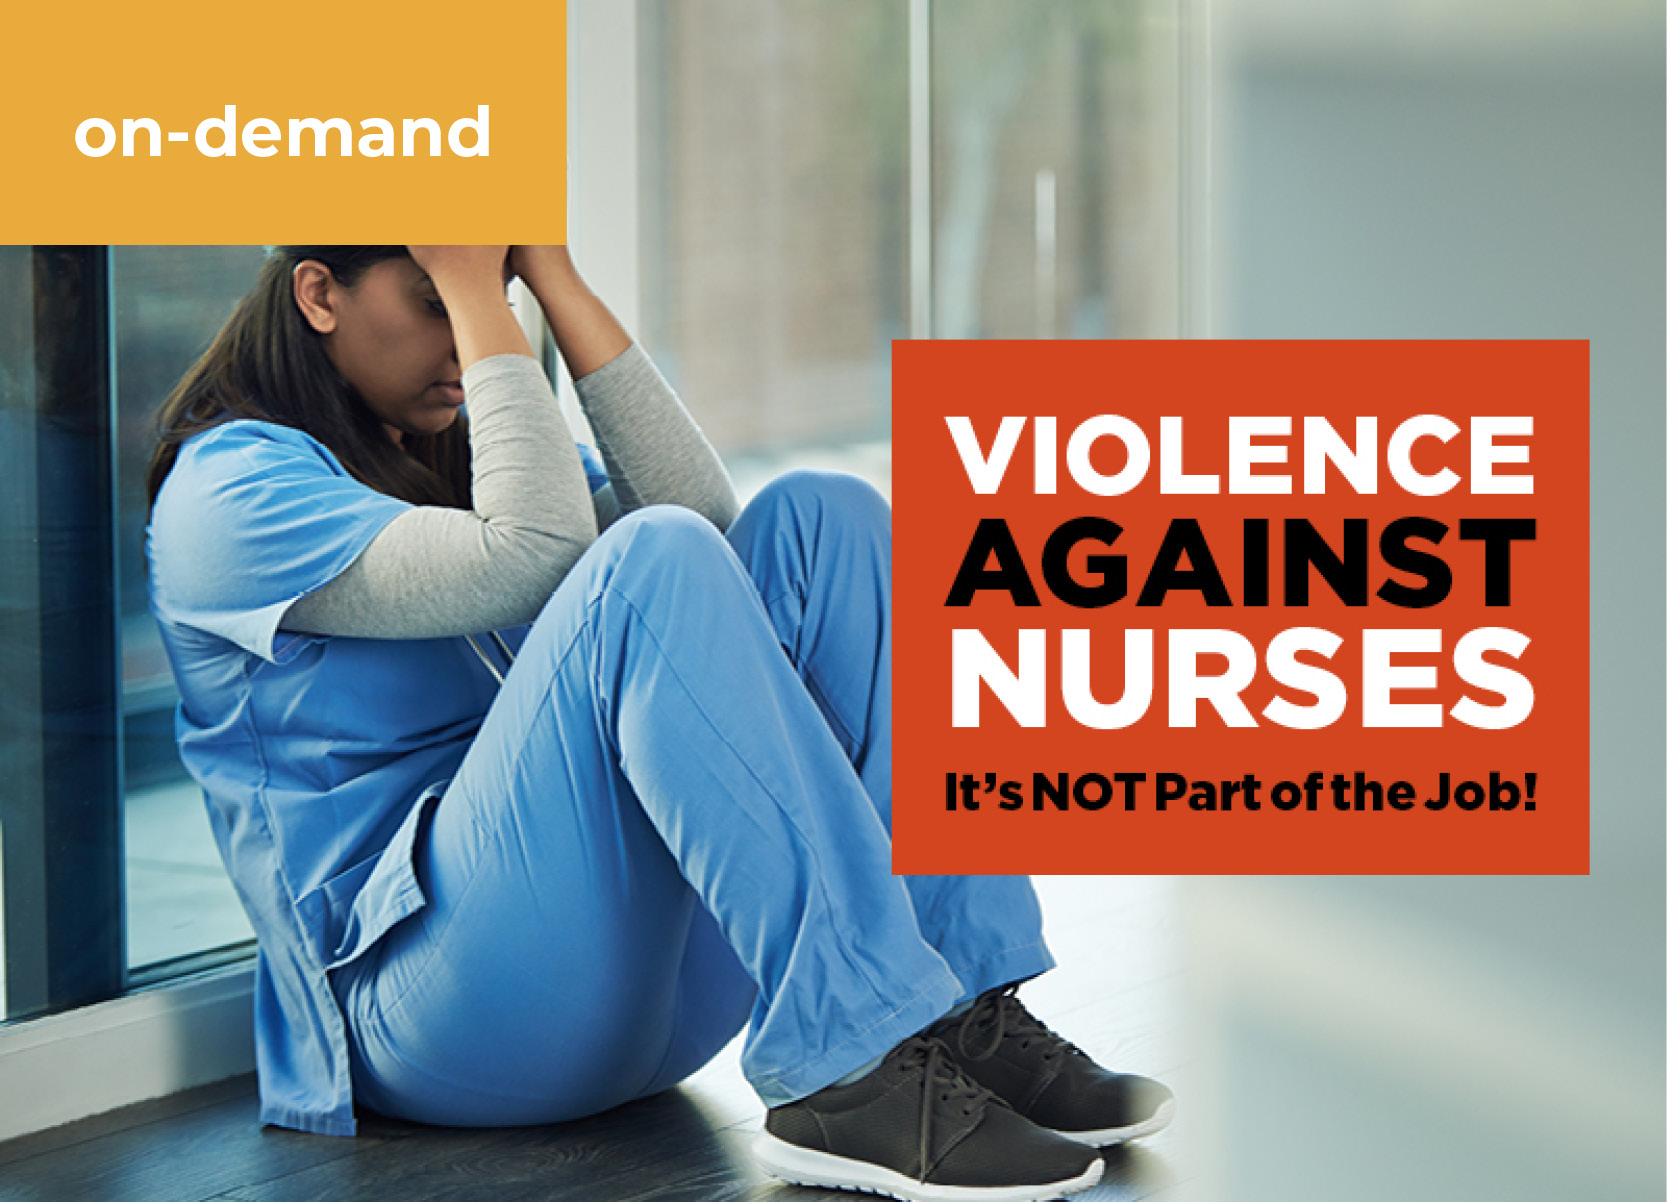 Violence Against Nurses: It's NOT Part of the Job